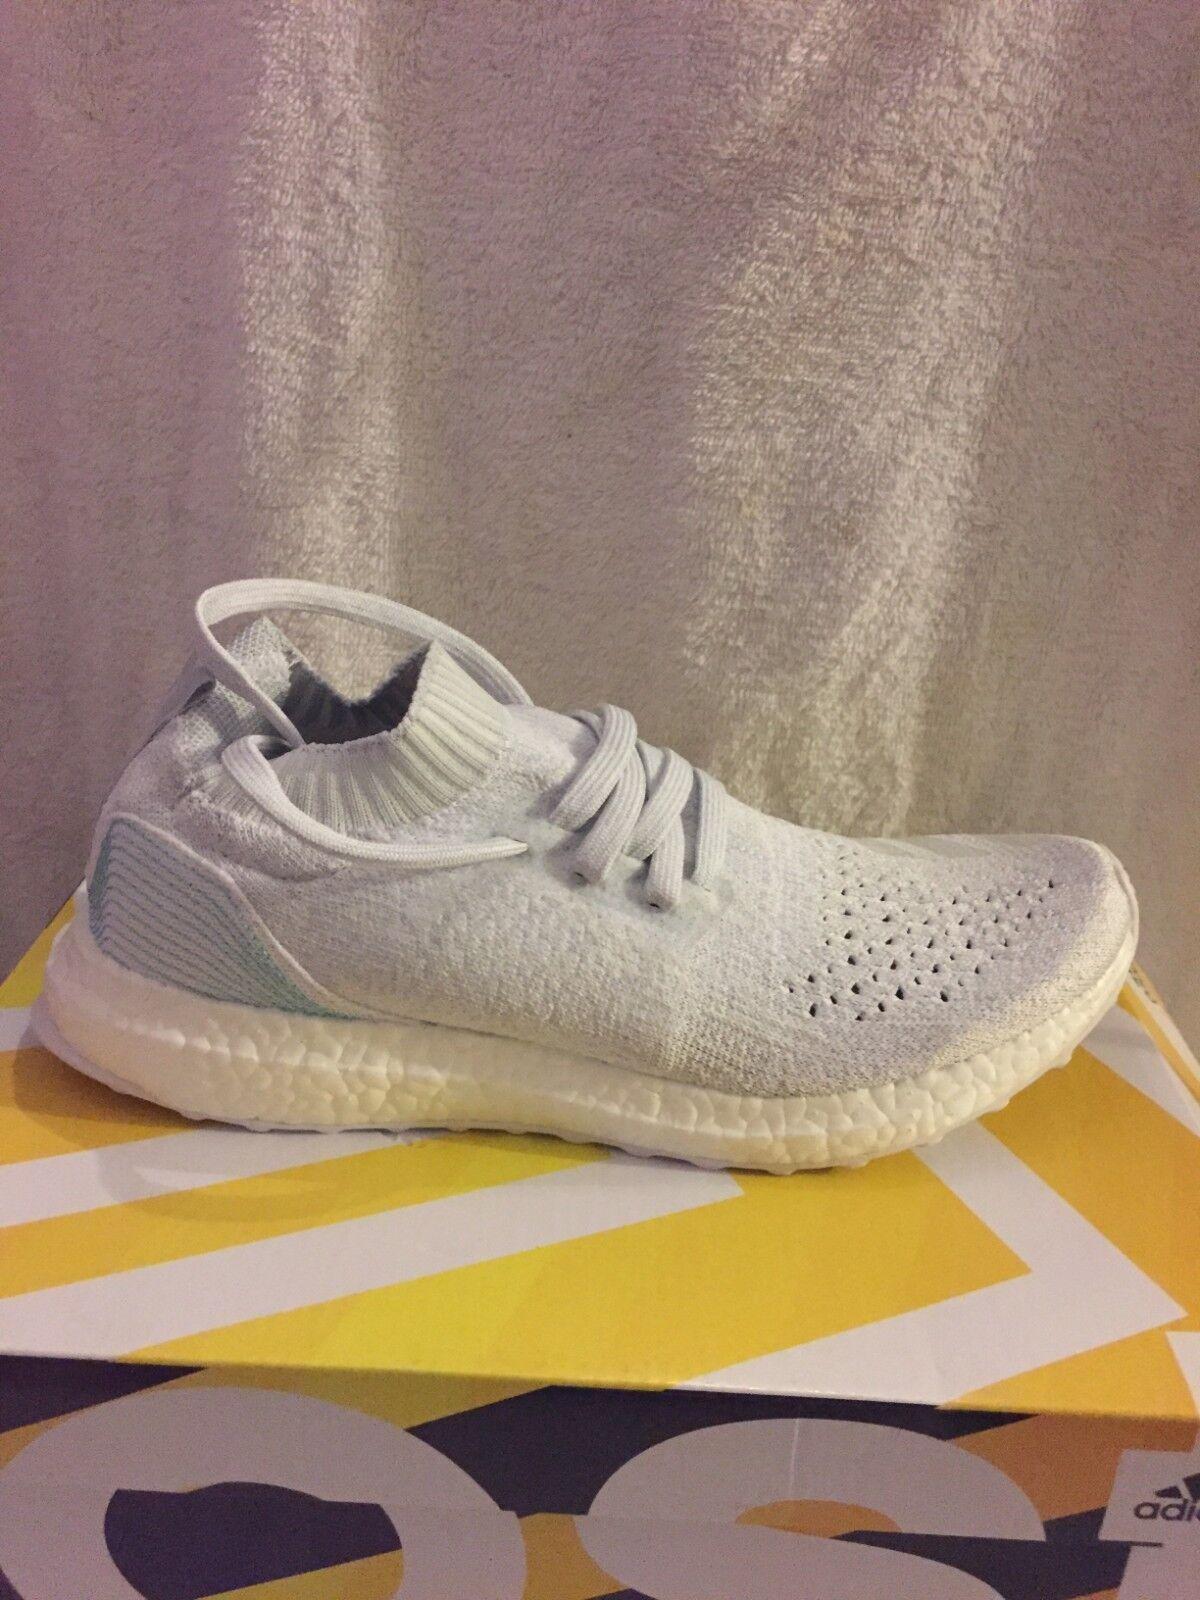 adidas x größe parley weiße ultra auftrieb uncaged ltd bb4073 größe x 7 ultraboost pk 7e1a7e